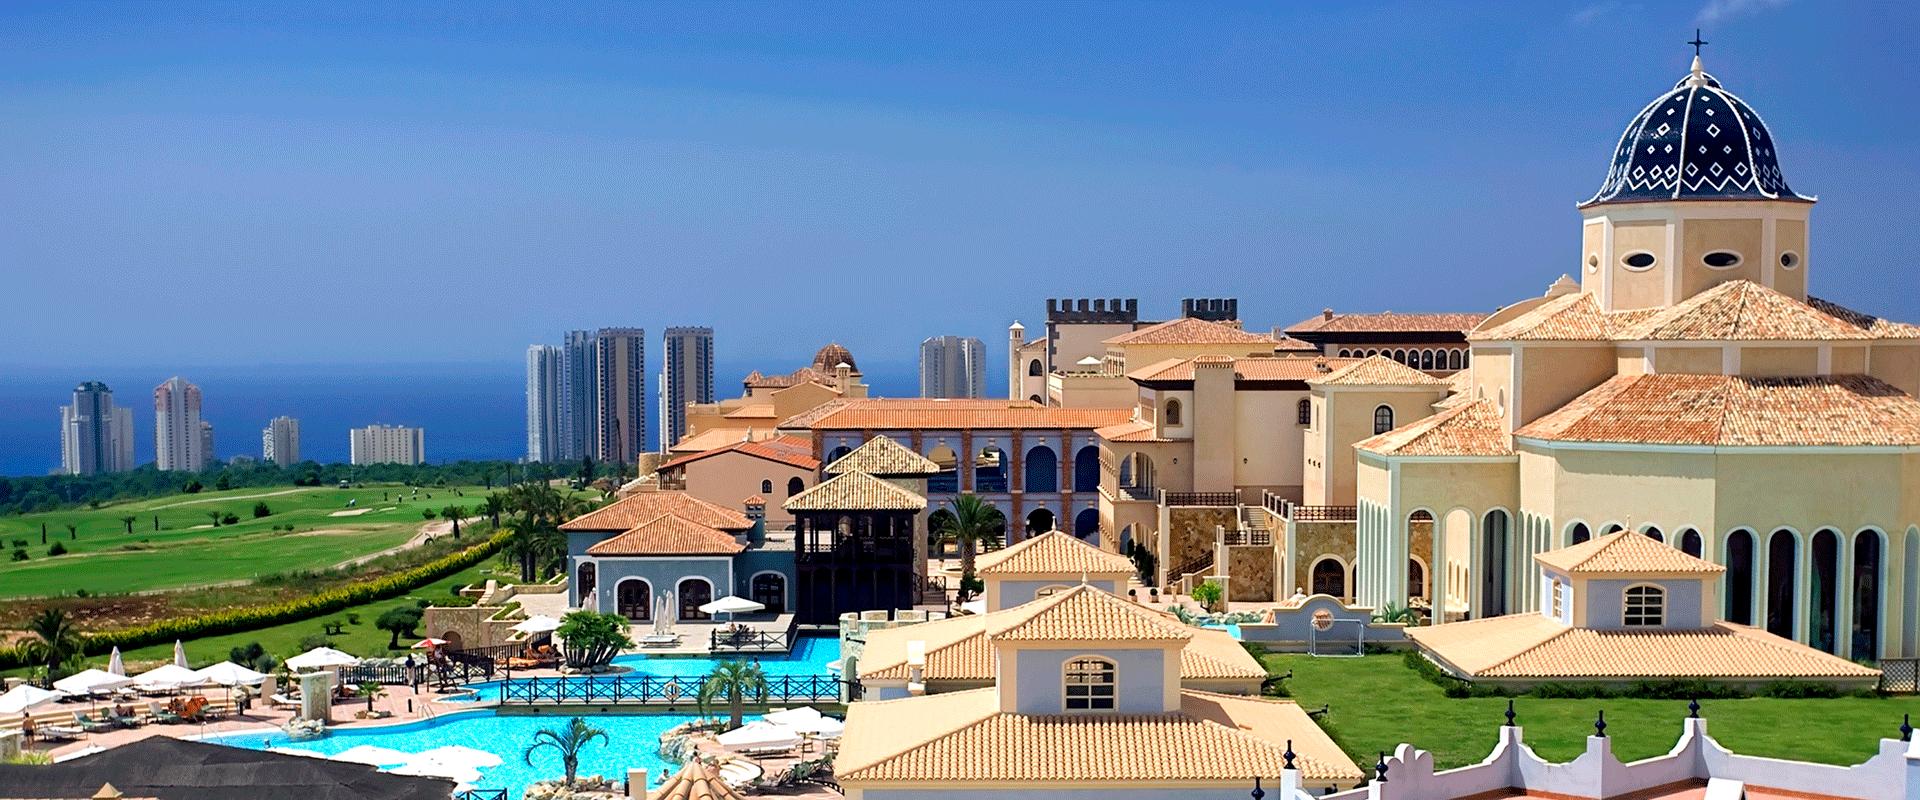 Din Golfreise Hotel Melia Villaitana i Benidorm, Spania - utsikt